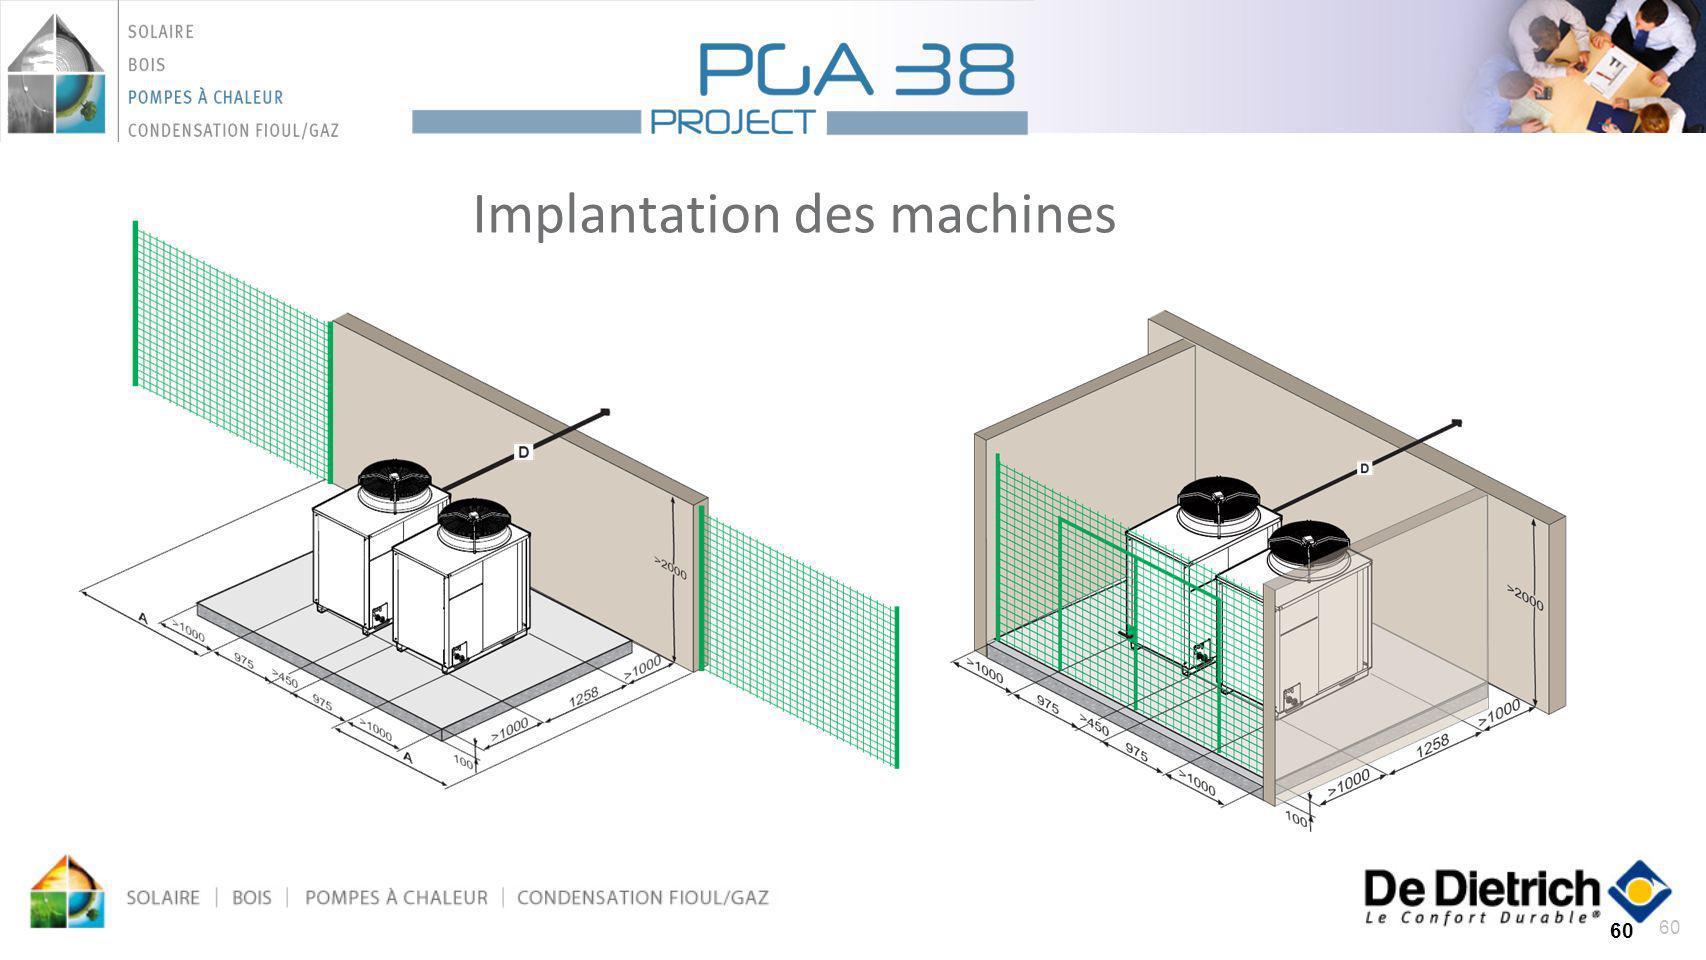 Implantation des machines